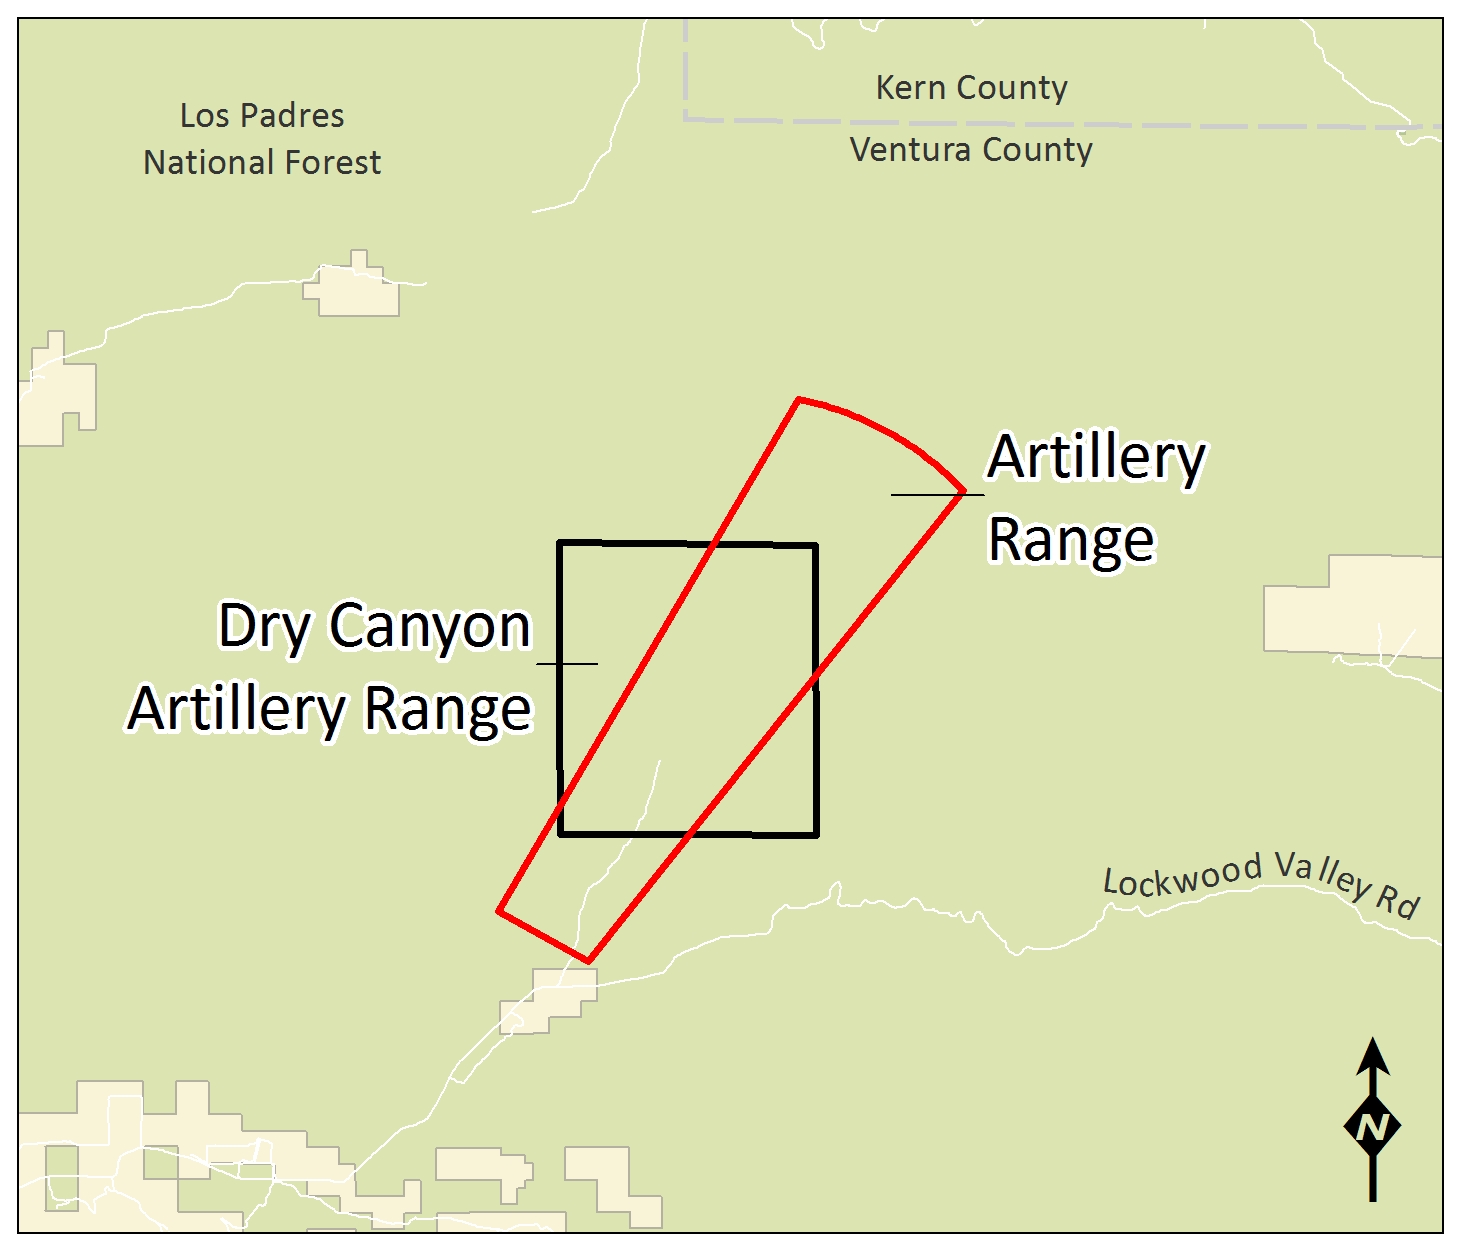 Dry Canyon Artillery Range